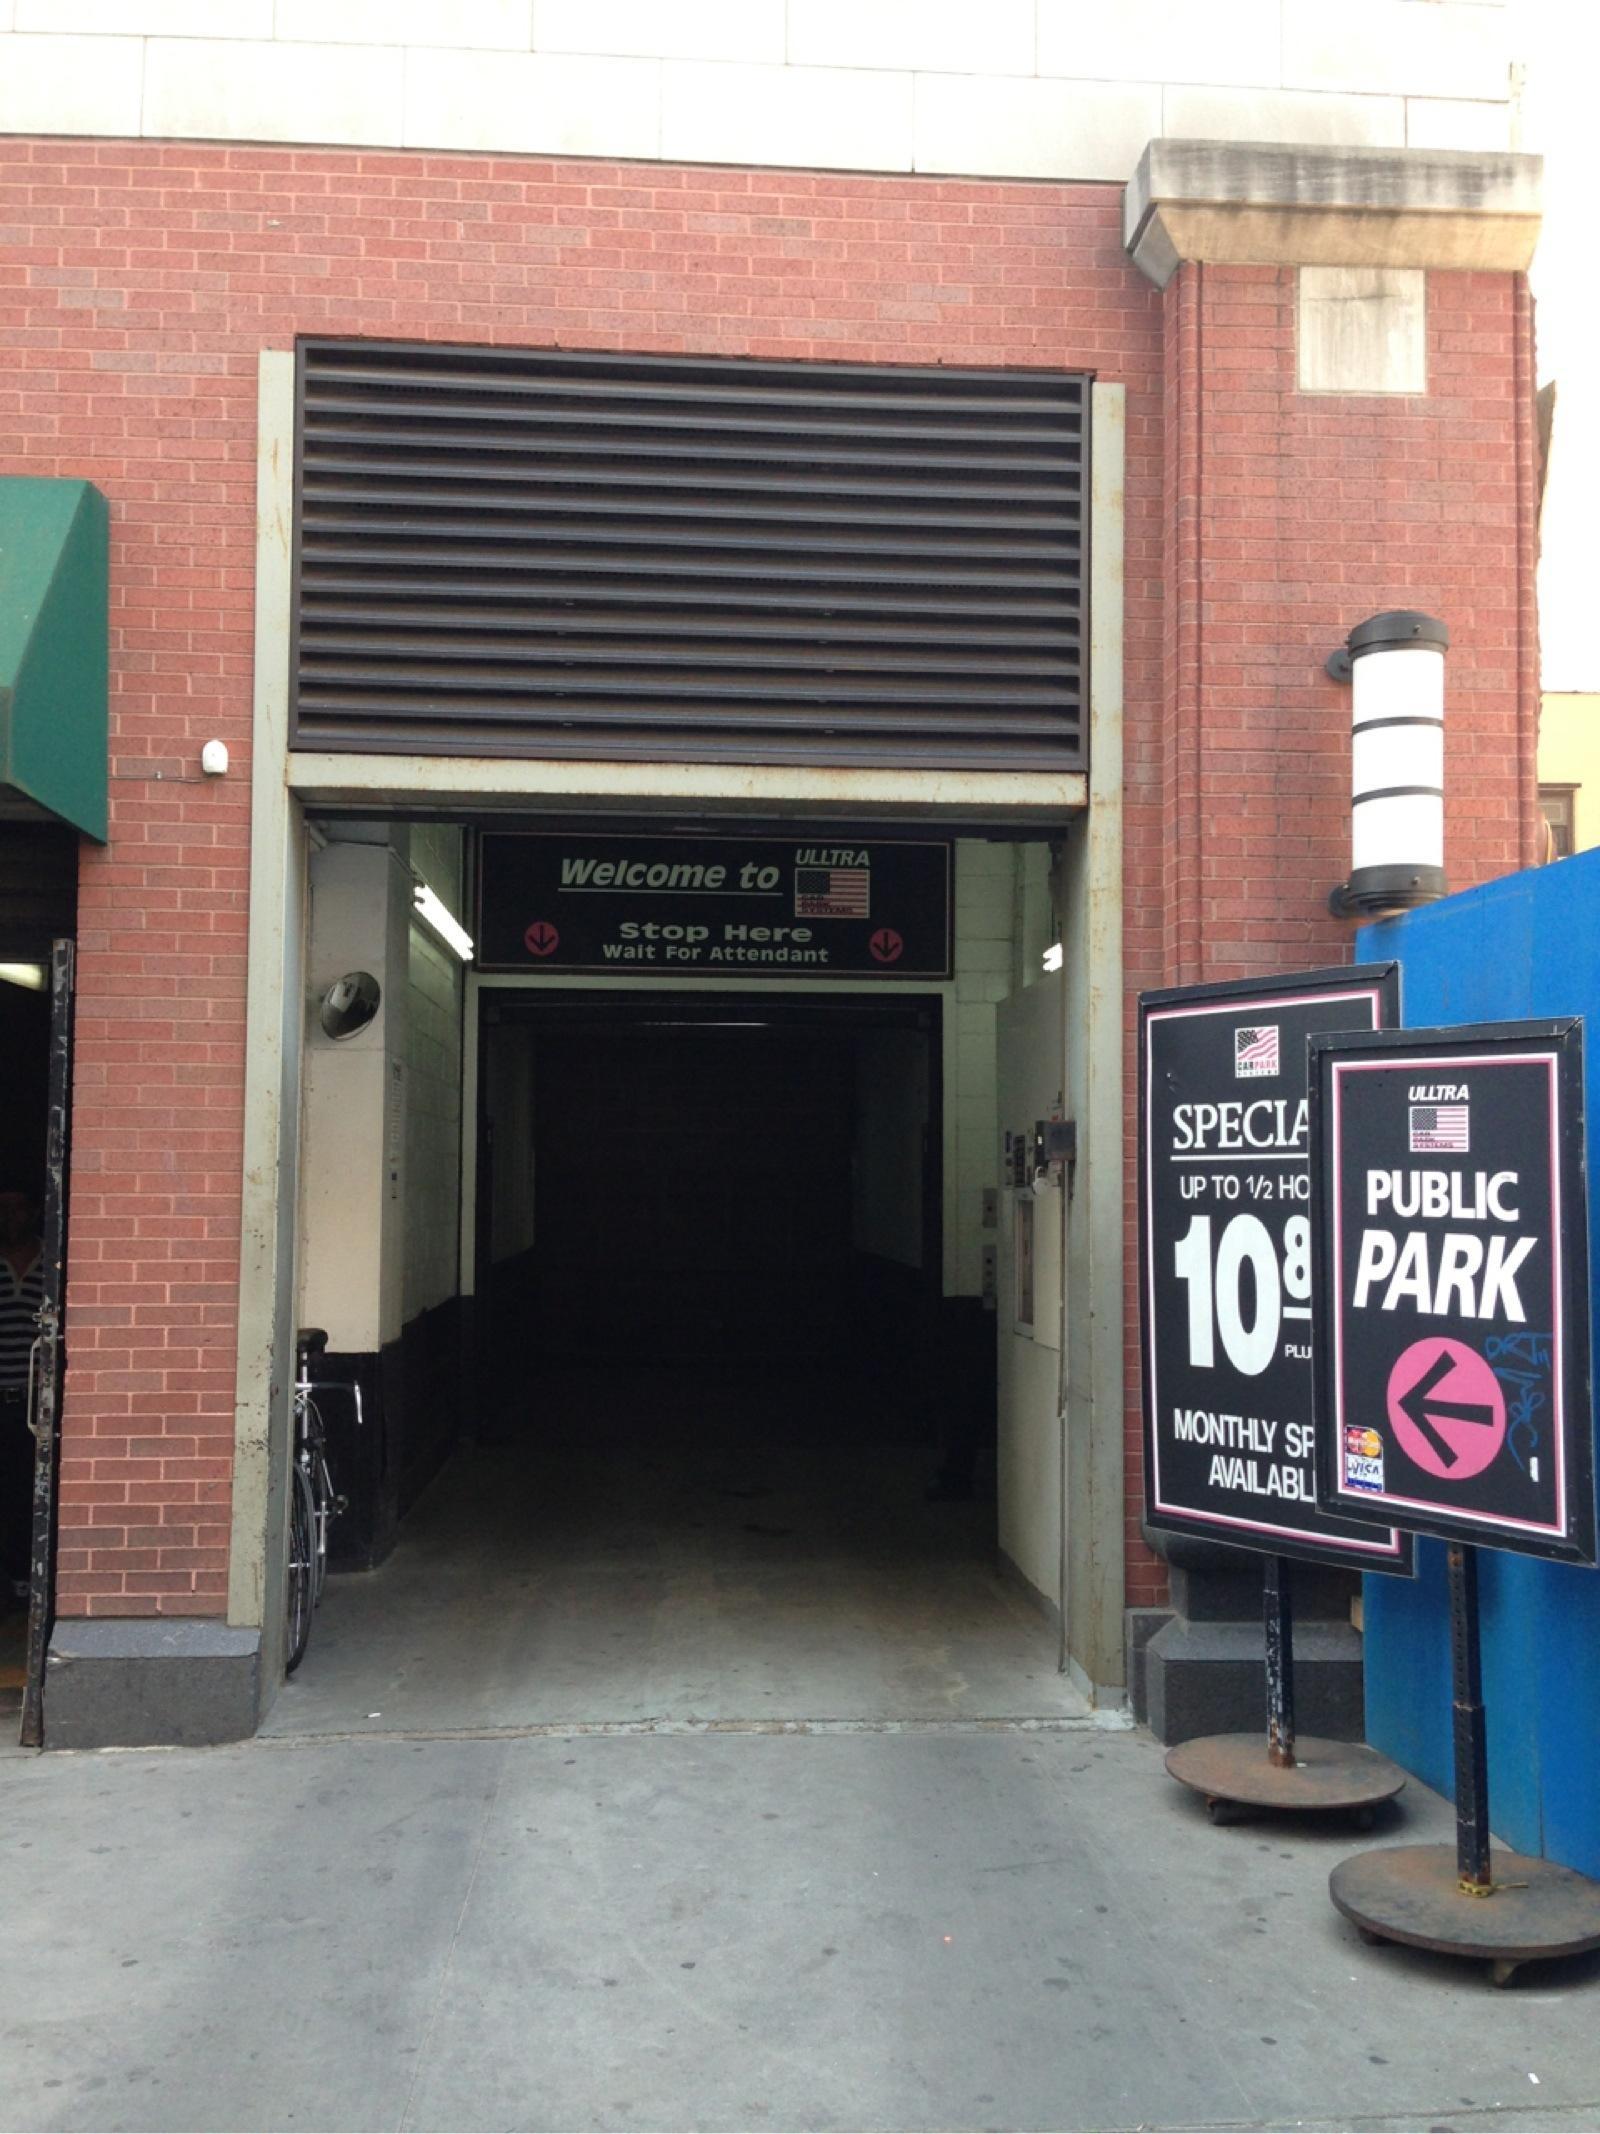 180 Montague St Garage - Parking in Brooklyn | ParkMe